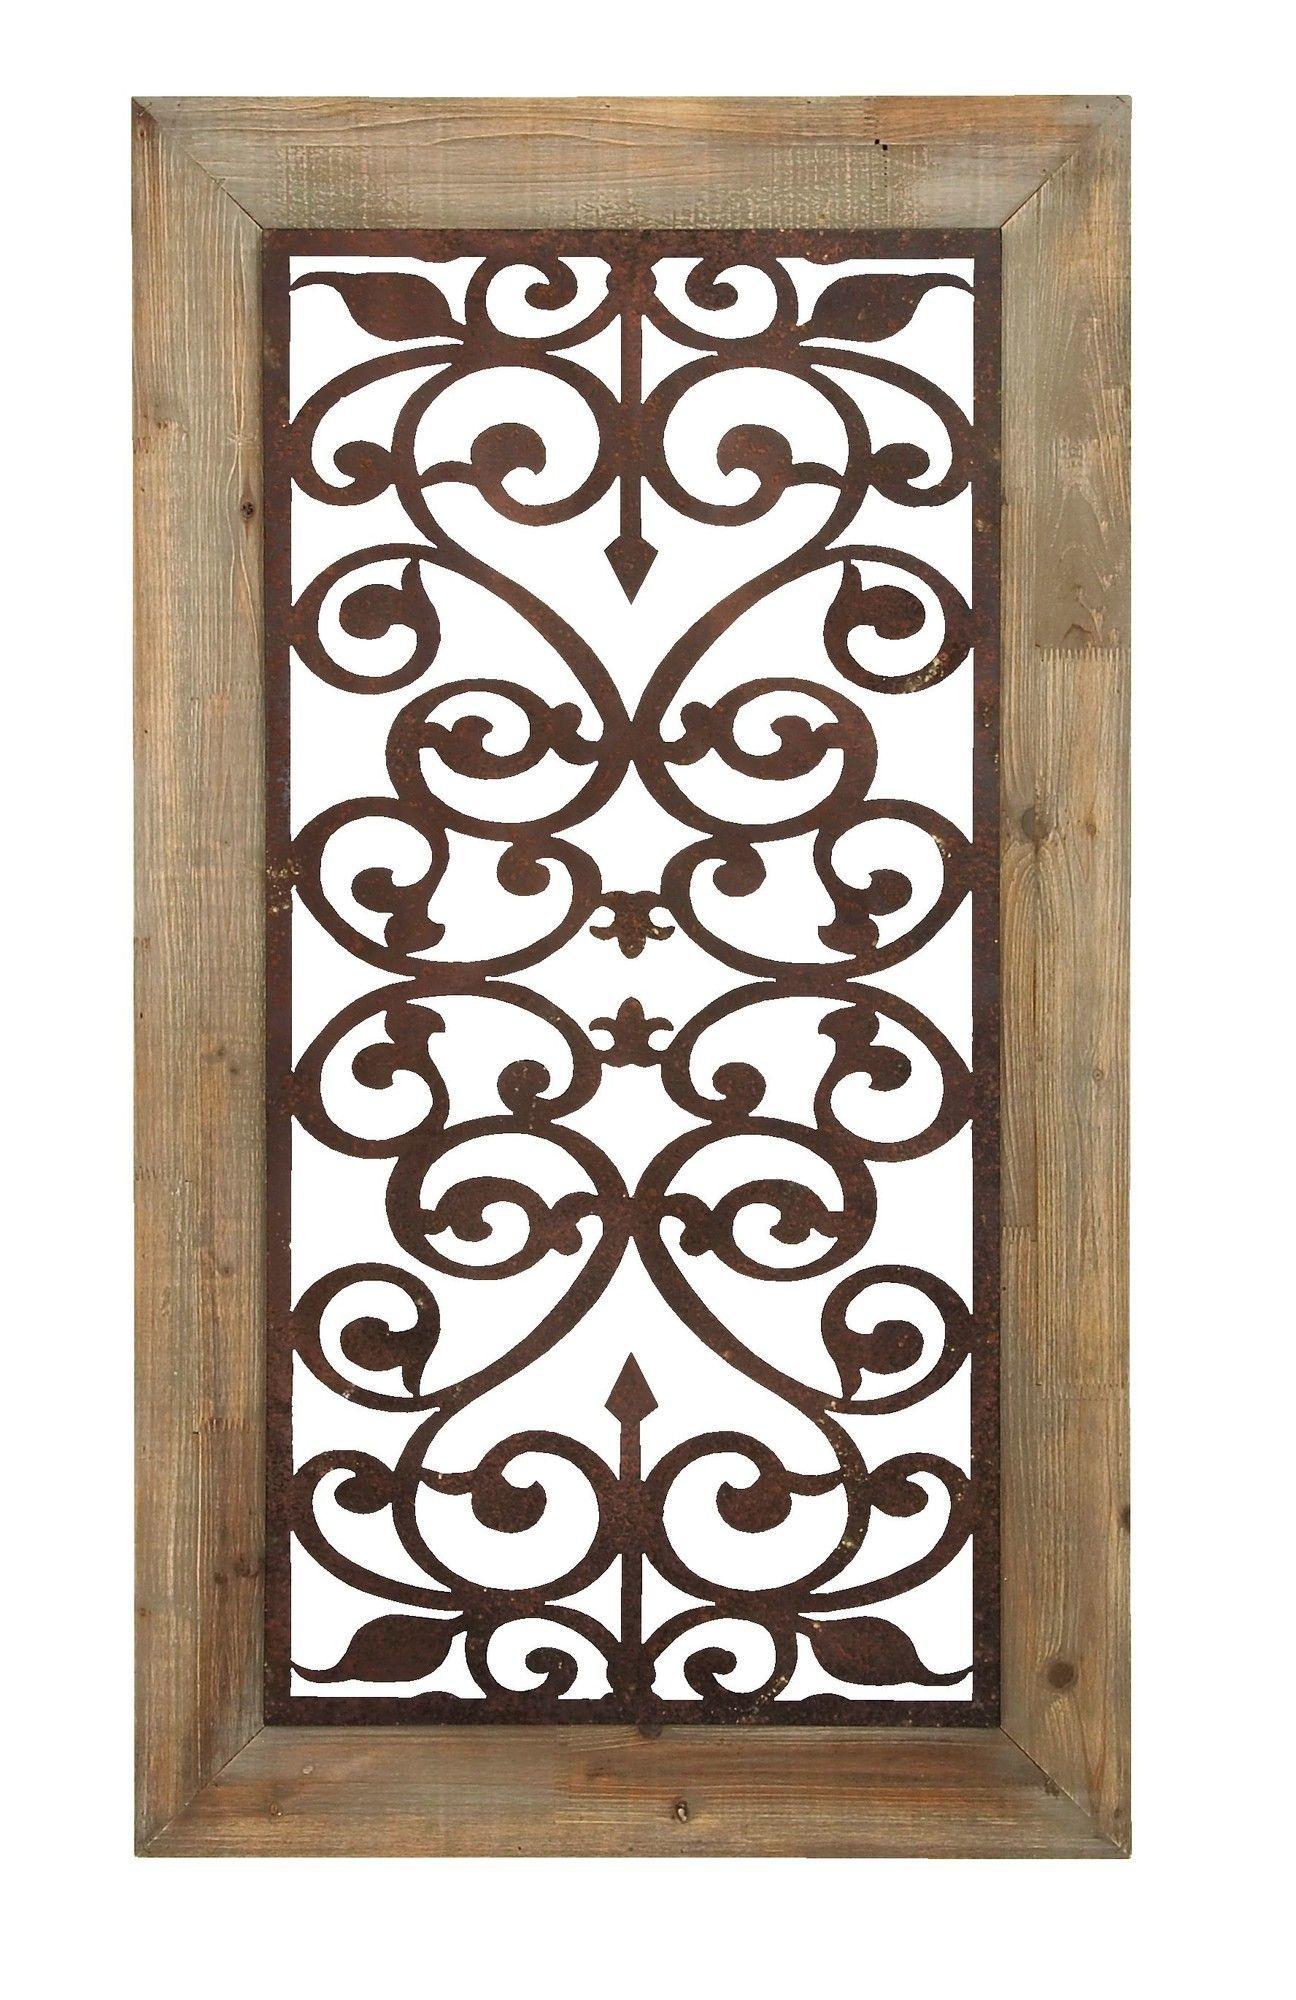 Cole & Grey Wood Metal Wall Decor | Art | Wall Decor, Wood Throughout Wall Decor By Cole & Grey (View 3 of 30)